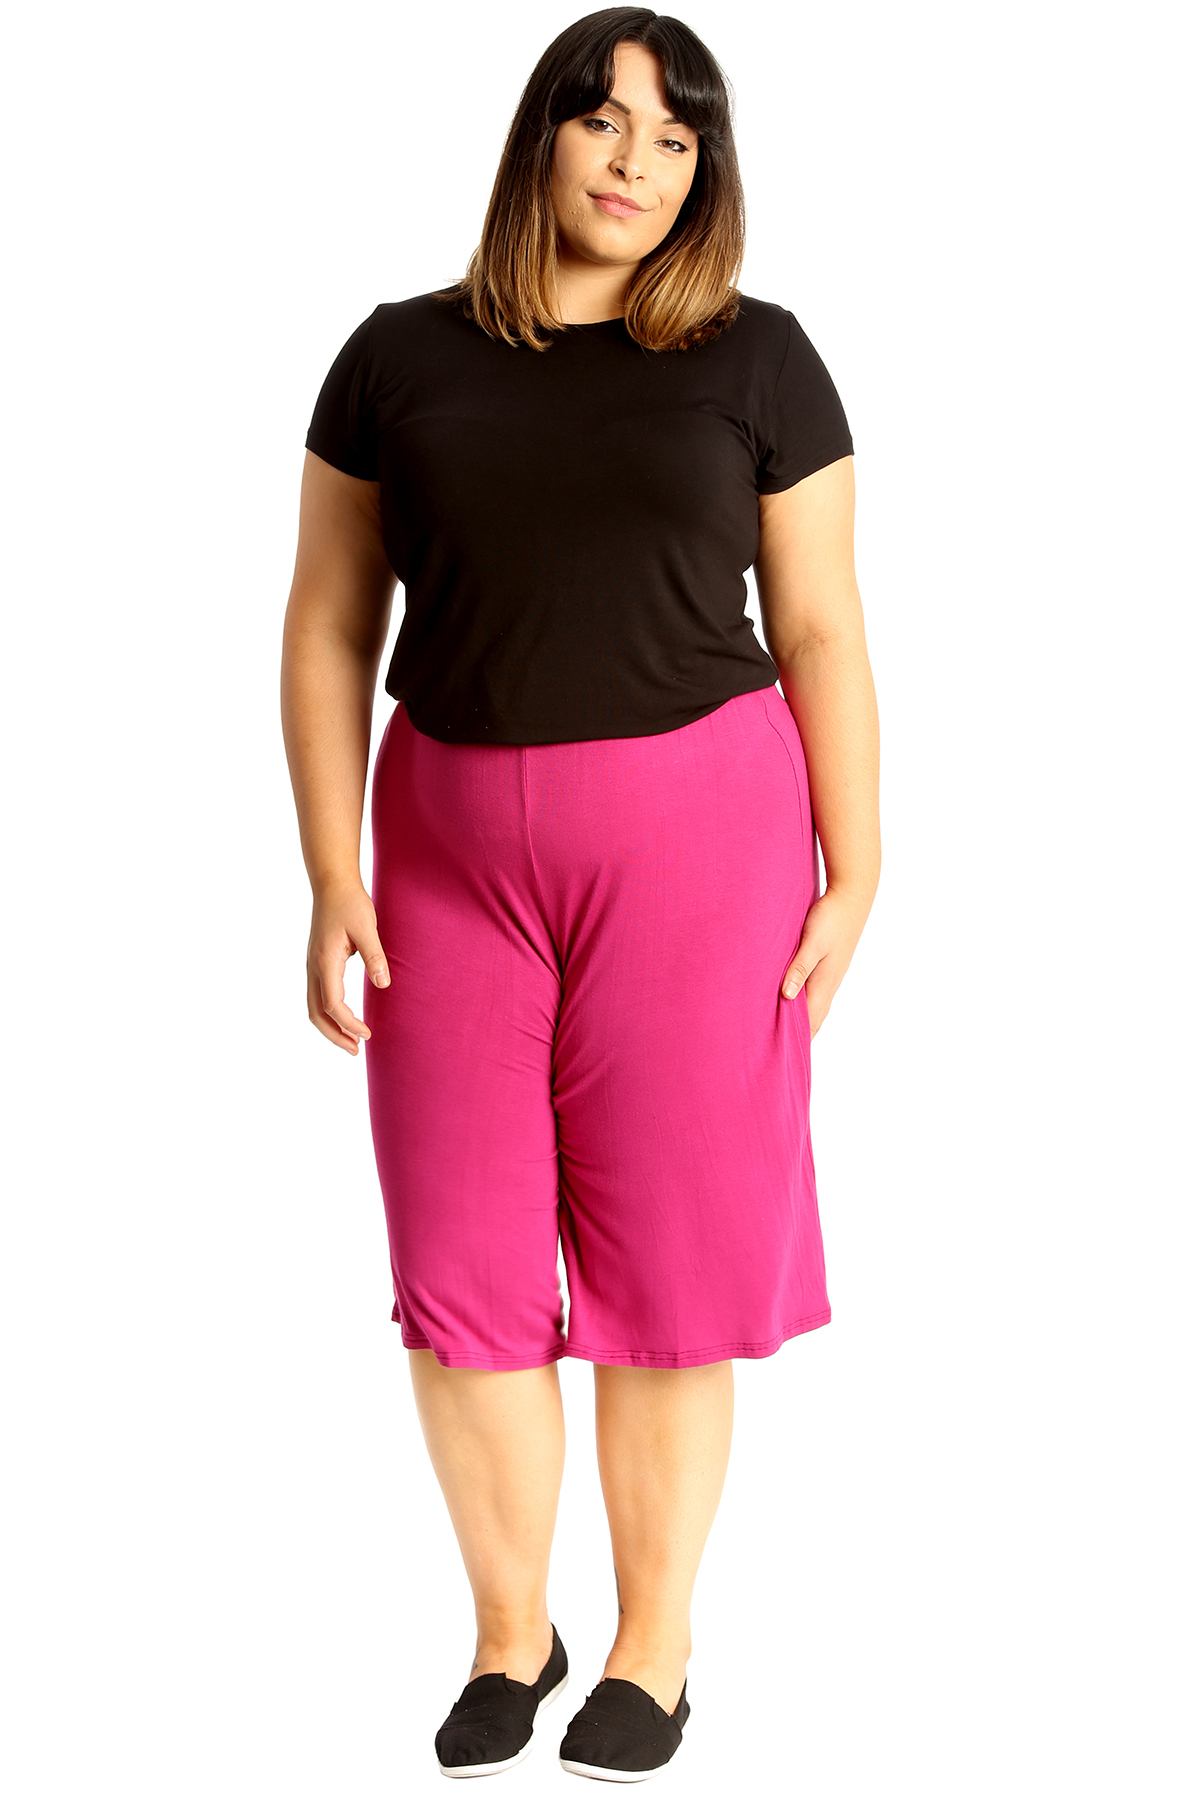 New-Womens-Plus-Size-Culottes-Ladies-Plain-Shorts-Palazzo-Elastic-Pants-Summer thumbnail 63